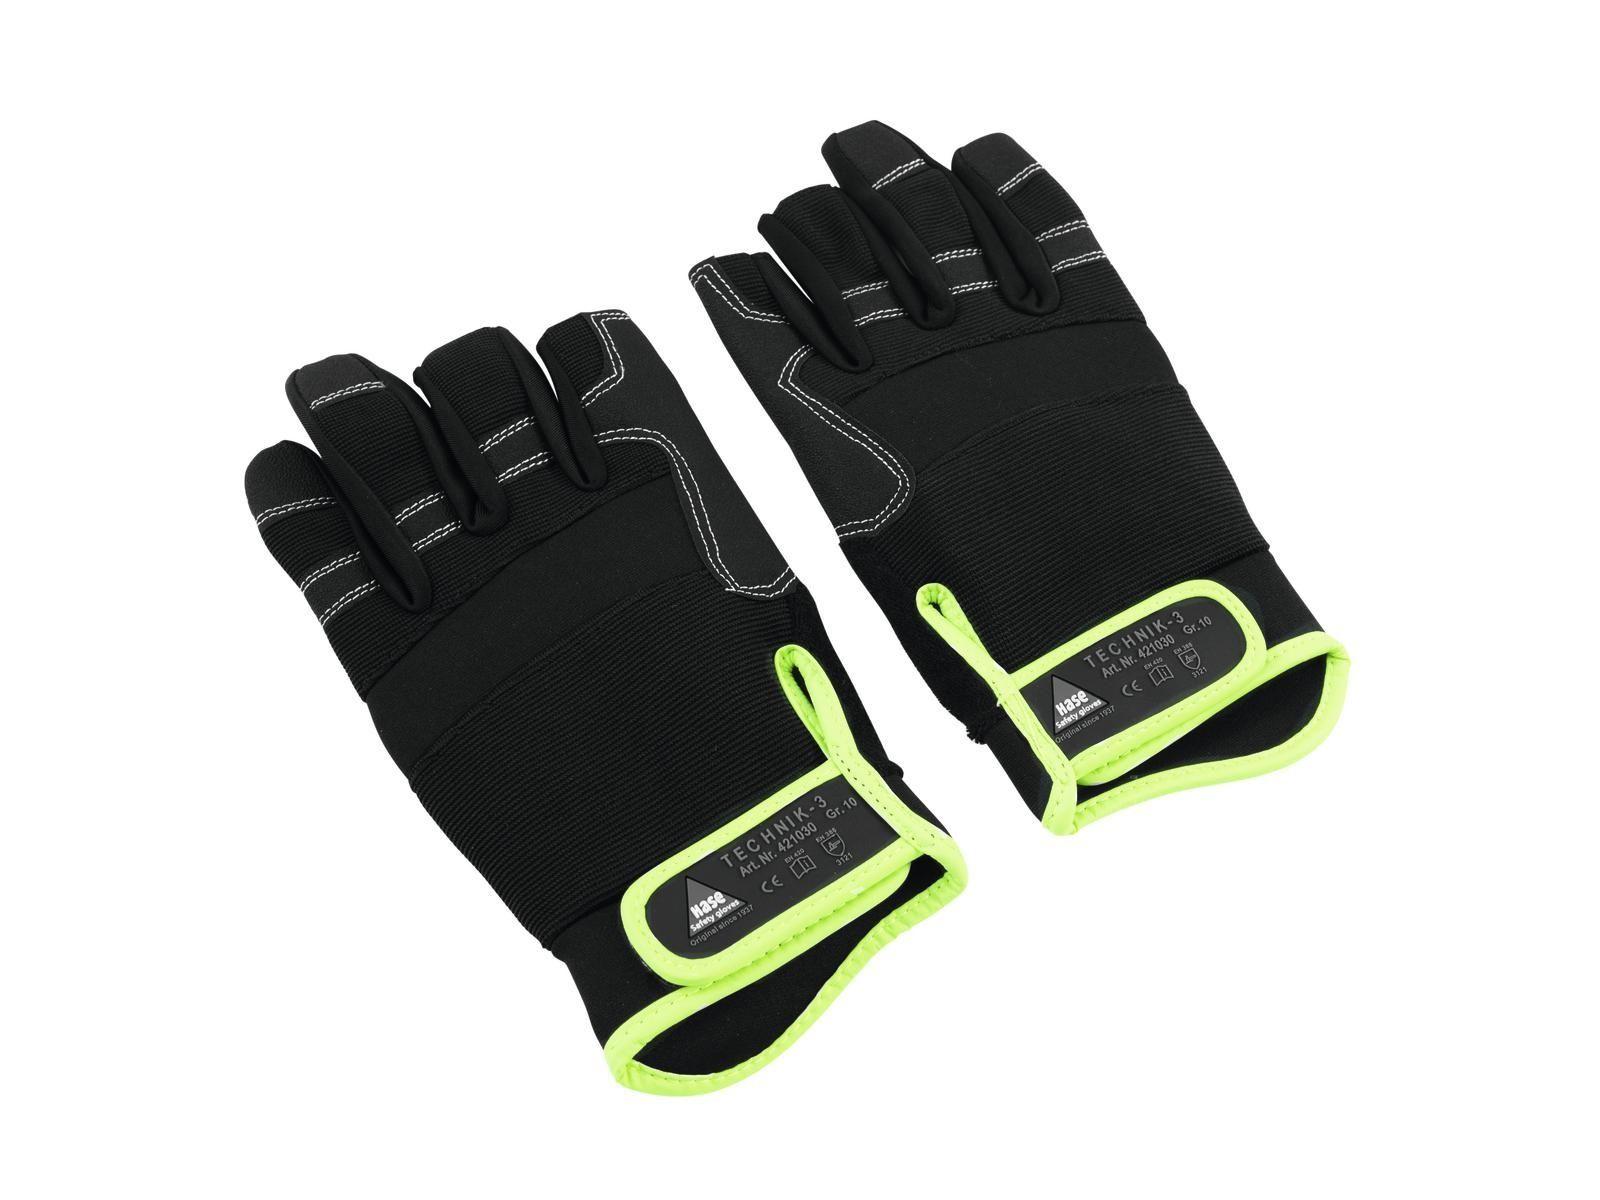 HASE Handschuhe 3 Finger, Größe M   Roadie-Handschuhe